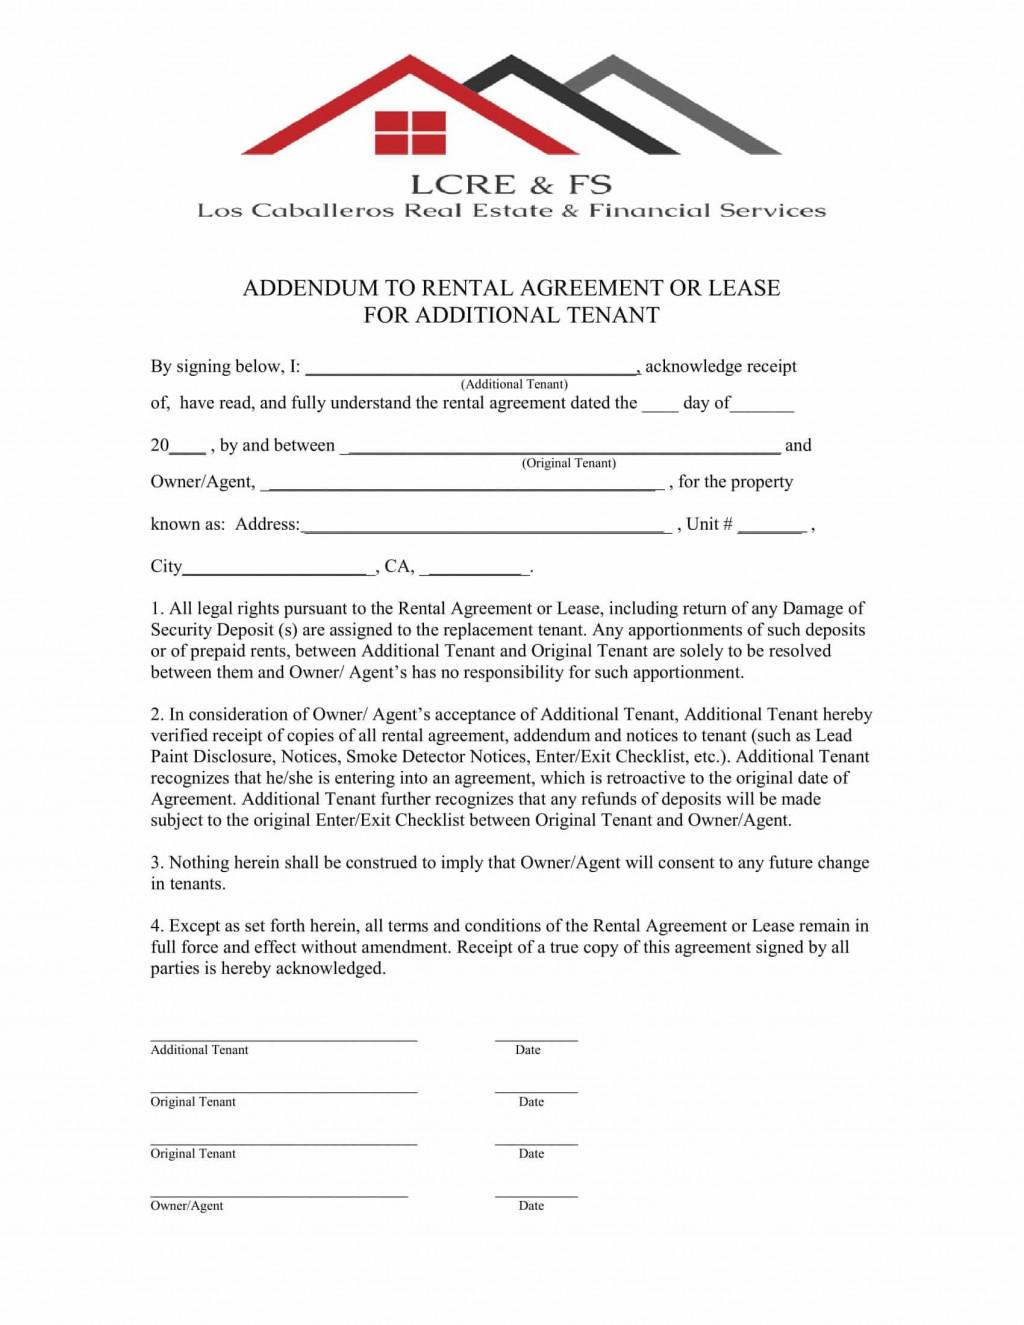 009 Singular Addendum Form For Rental Agreement Highest Quality Large